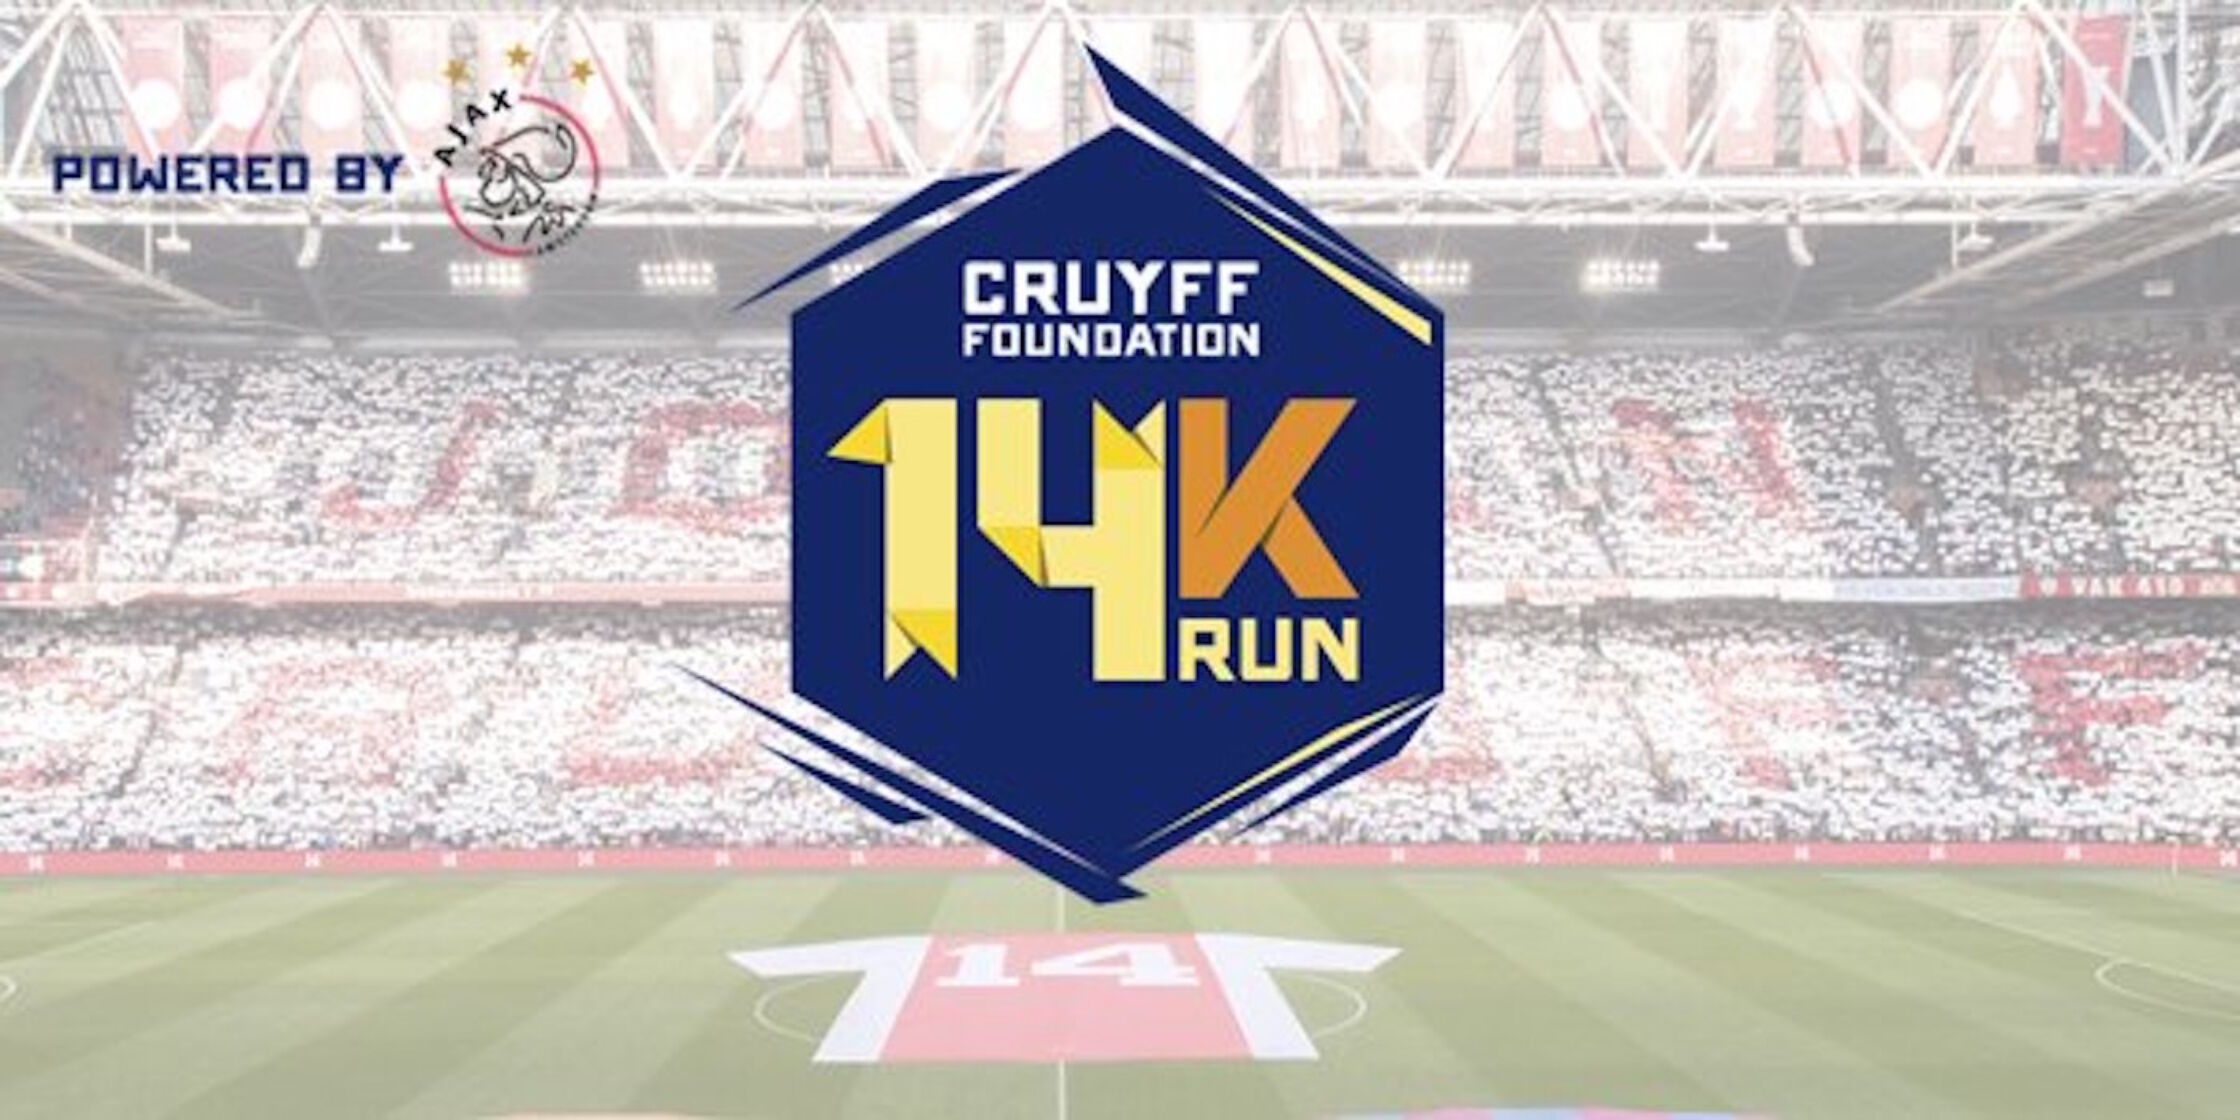 Inschrijving Cruyff Foundation 14K Run geopend!